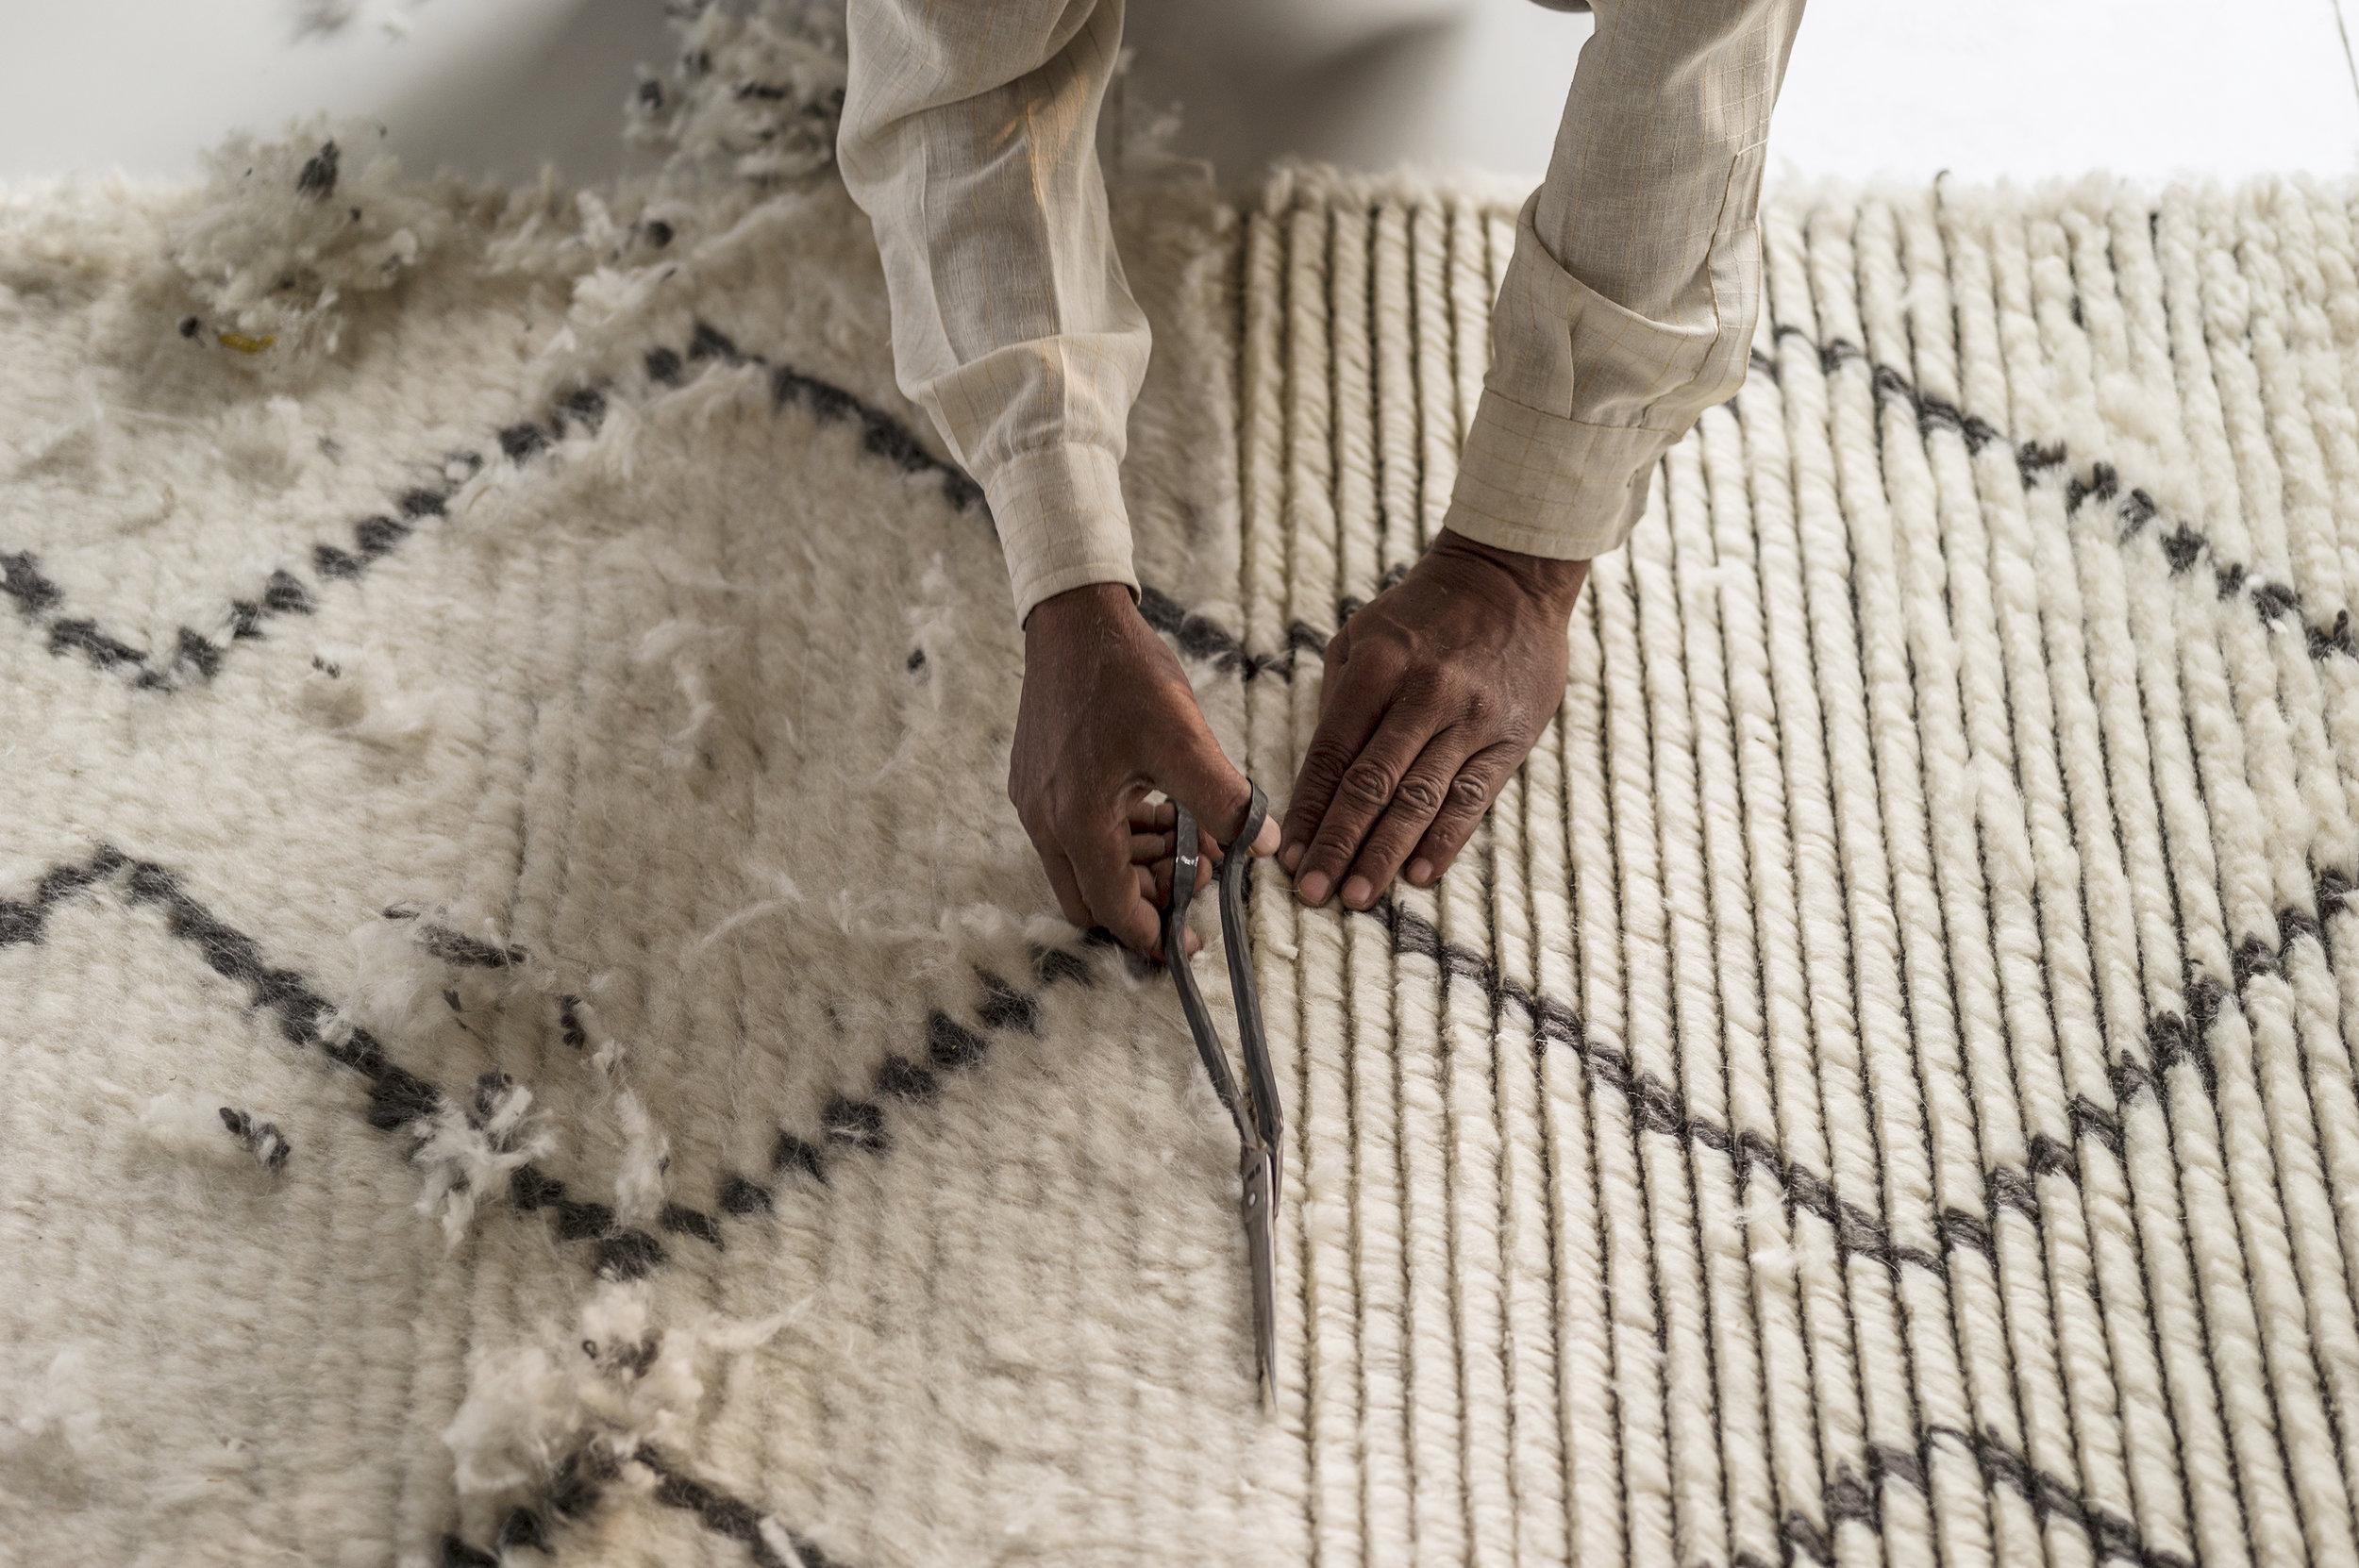 An artisan during the handmade process.